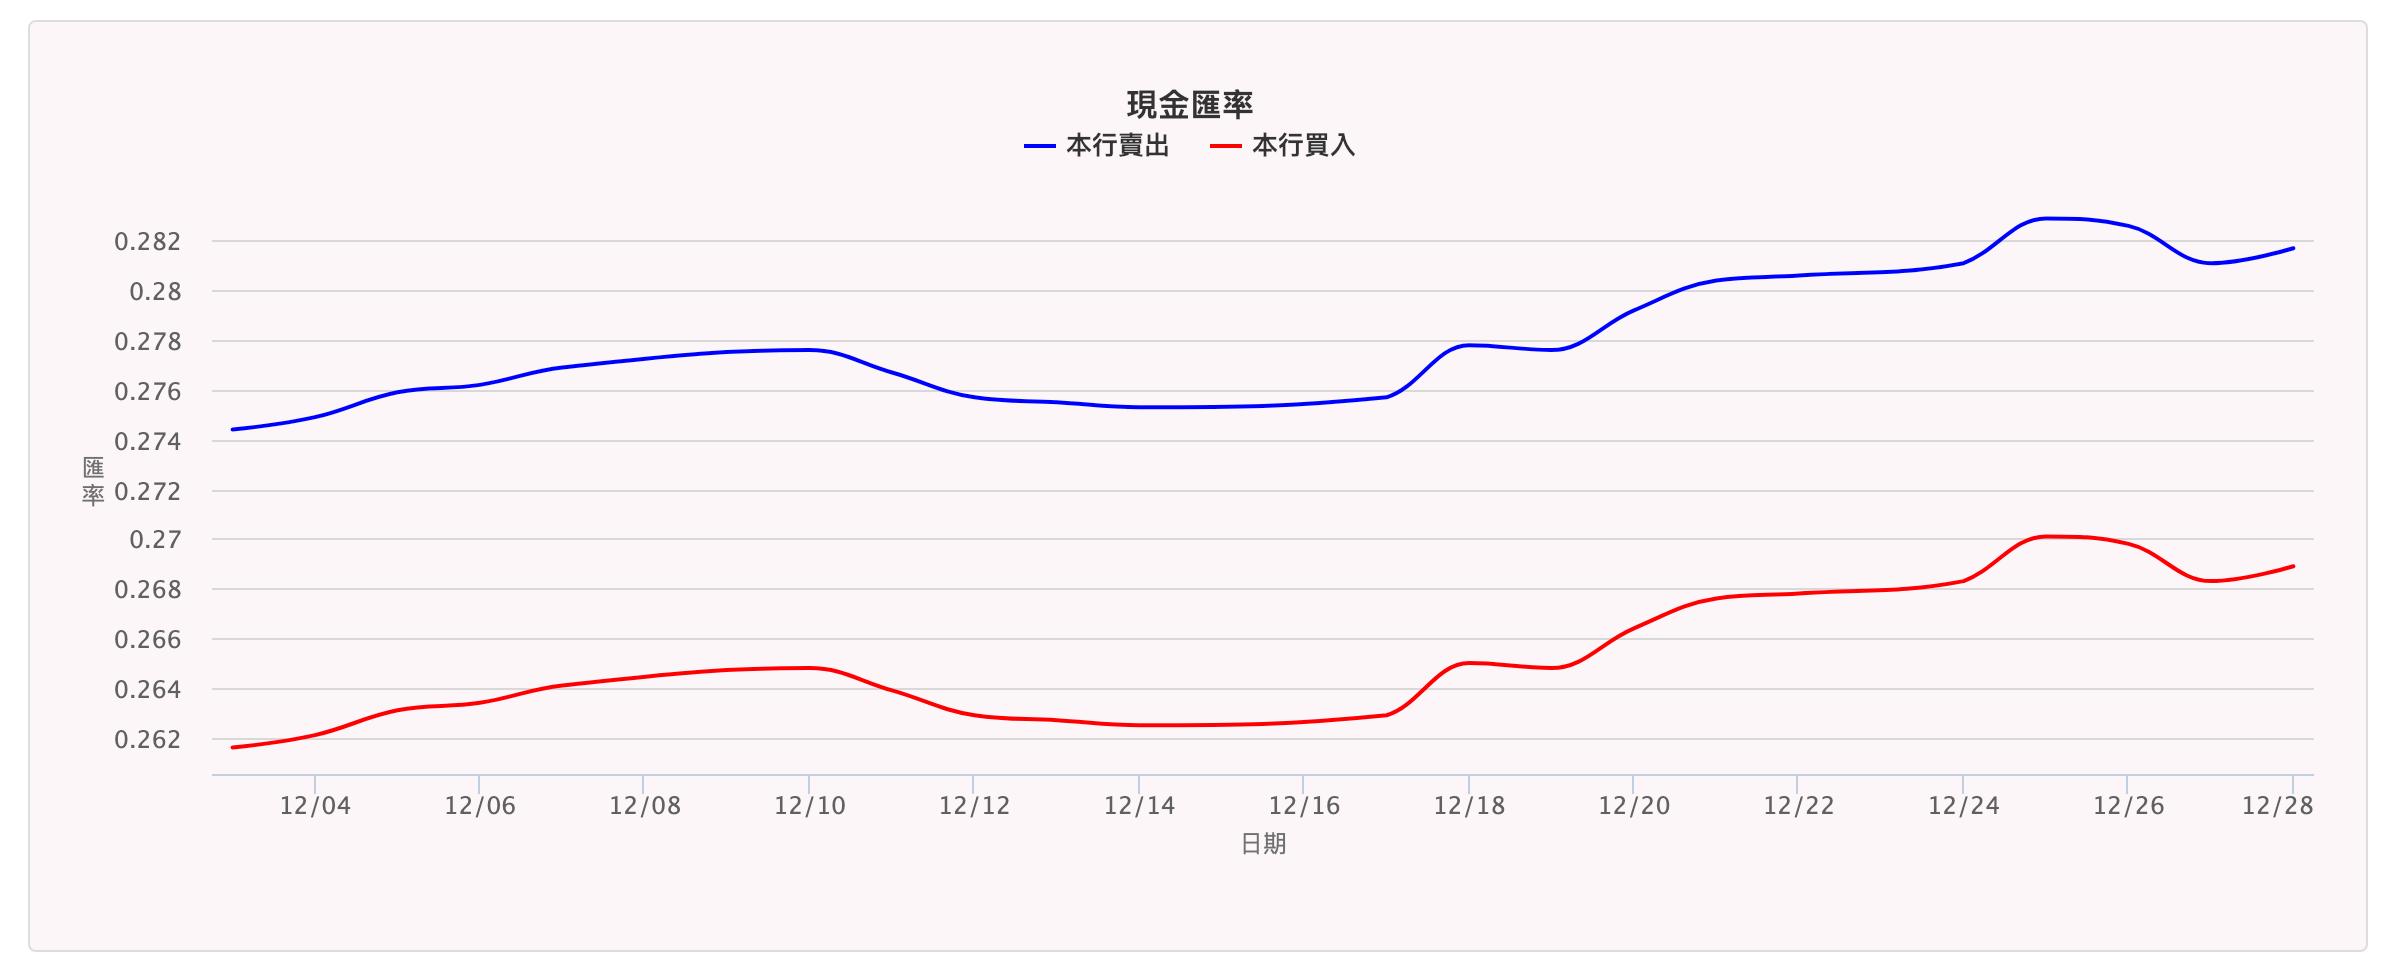 Japan Yen Dollars exchange NTD Rate 201812